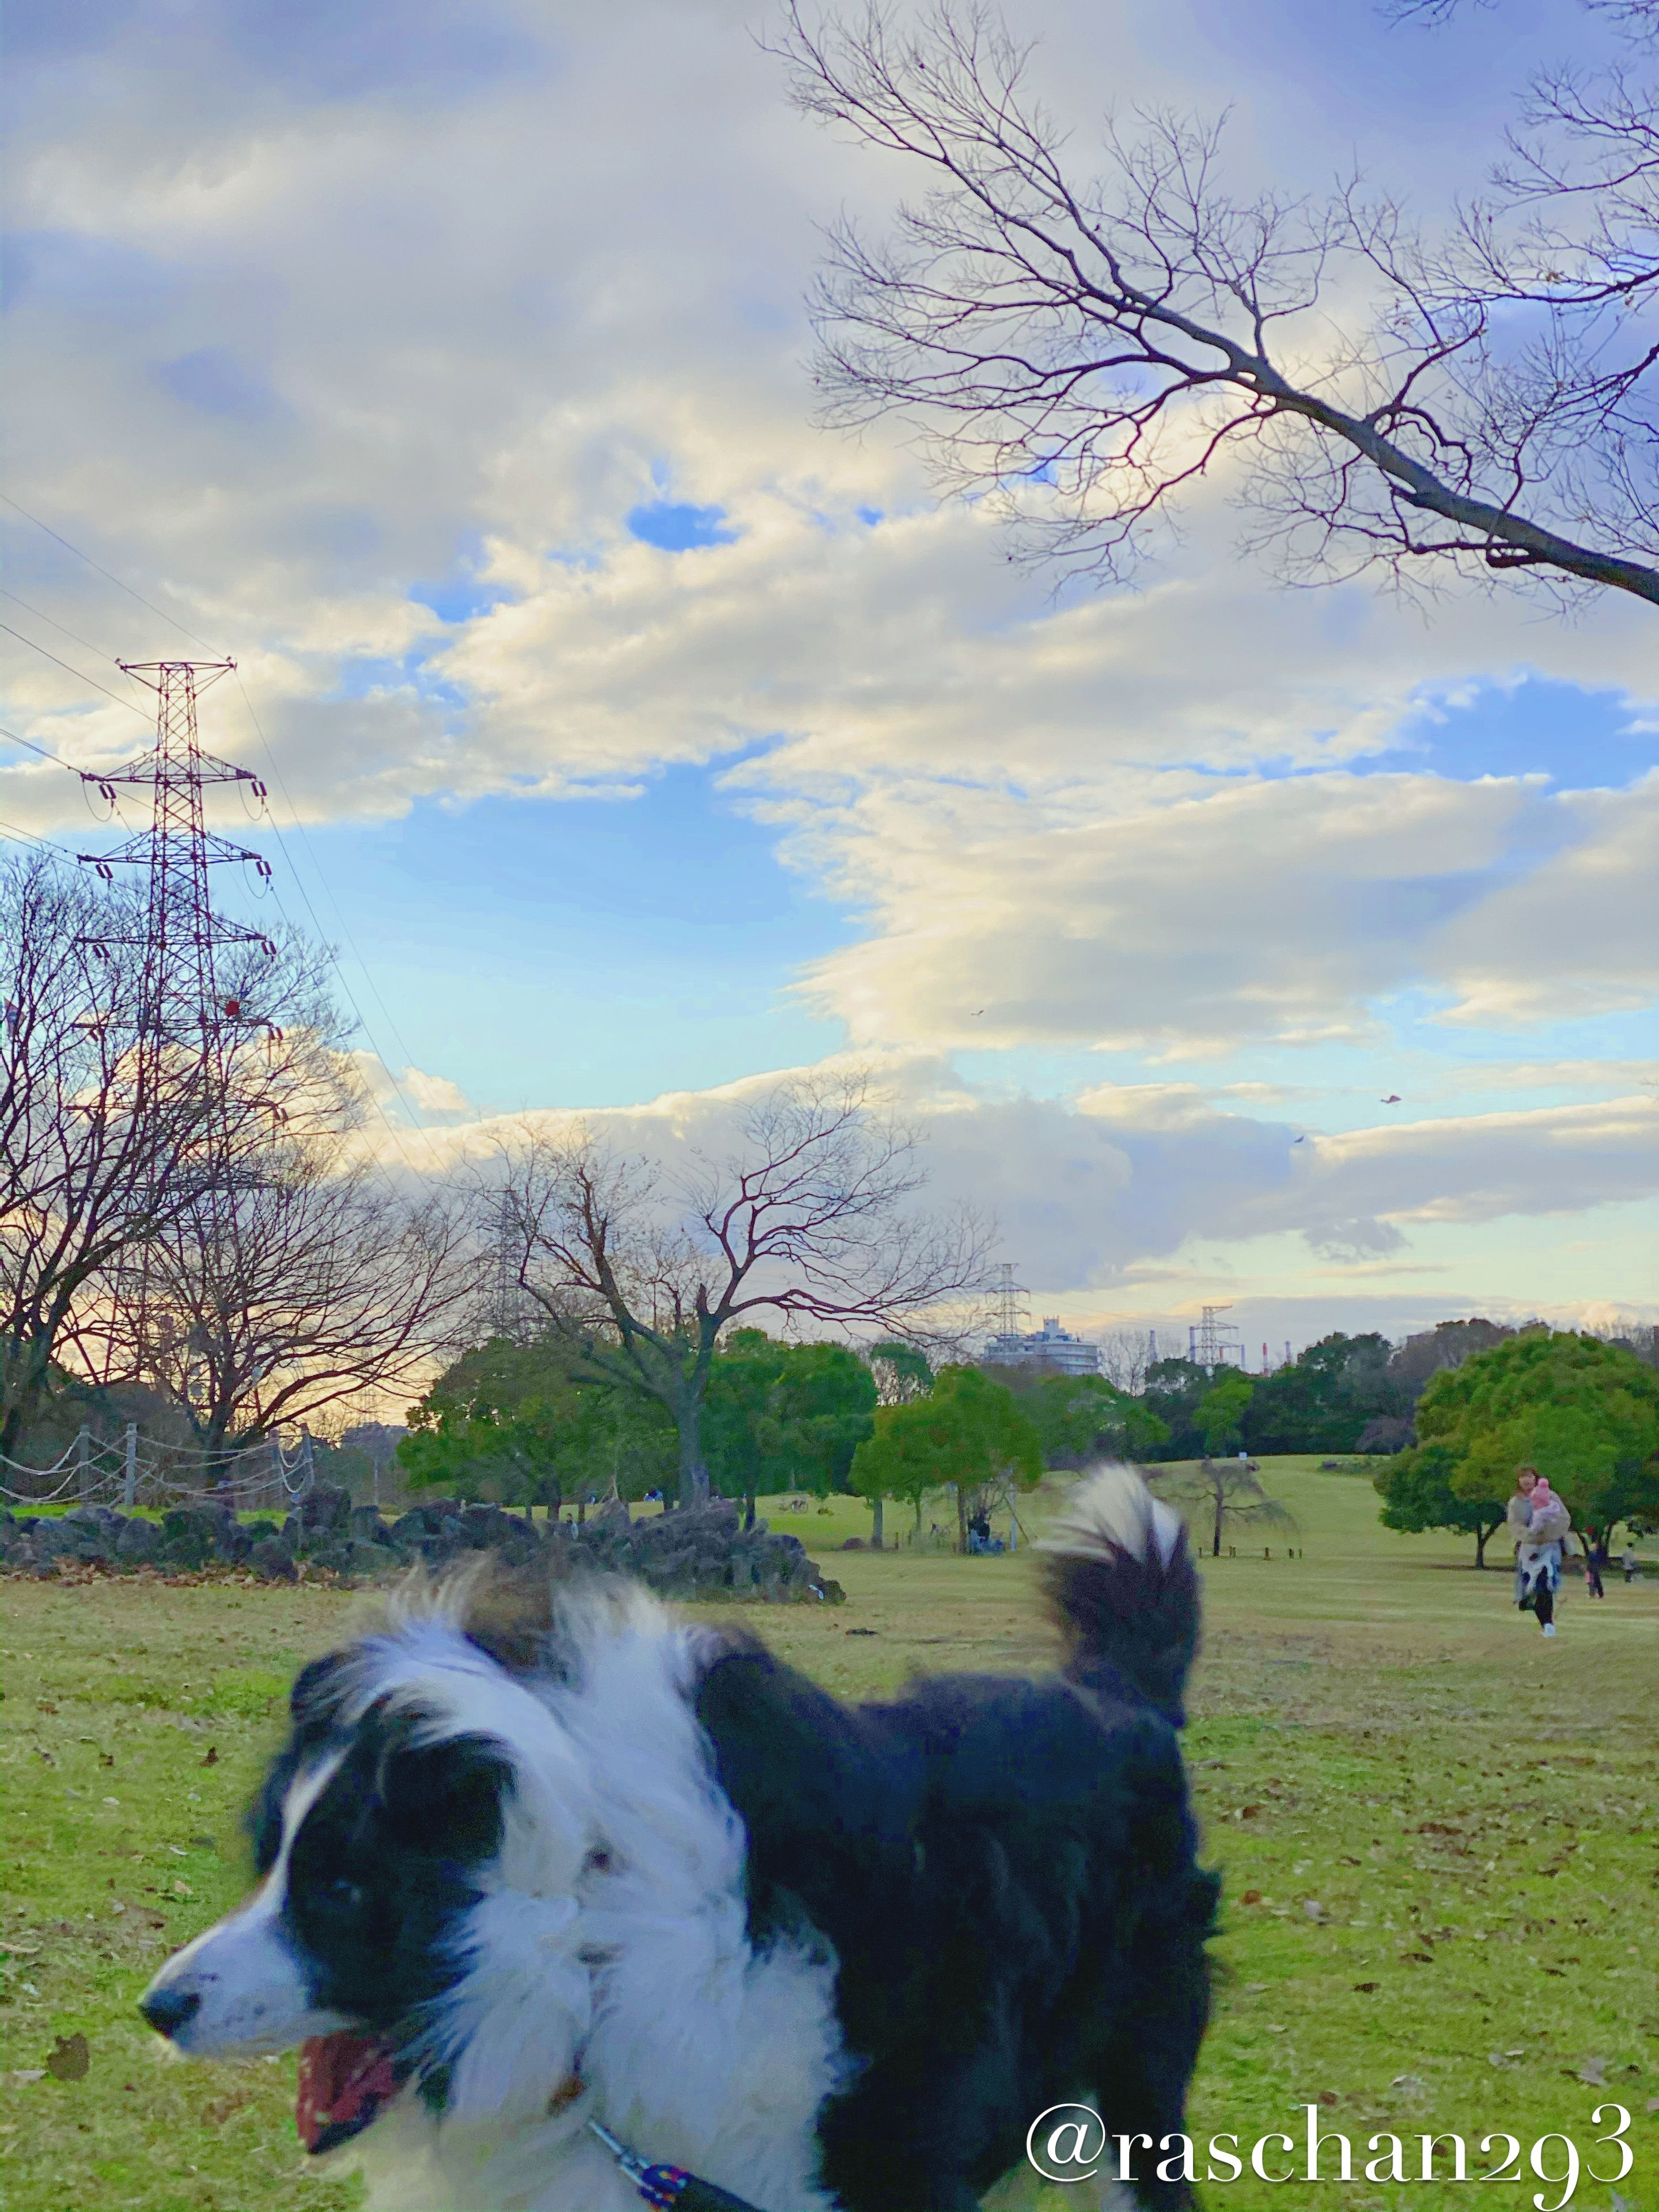 Bordercollie Dog Cute ボーダーコリー 可愛い 犬 愛犬 Pet ペット ワンちゃん 白黒 Whiteblack Japan Jepang Osaka Sakaicity お散歩 お散歩中 かわいい Jalanjala 2020 ボーダーコリー ペット 公園